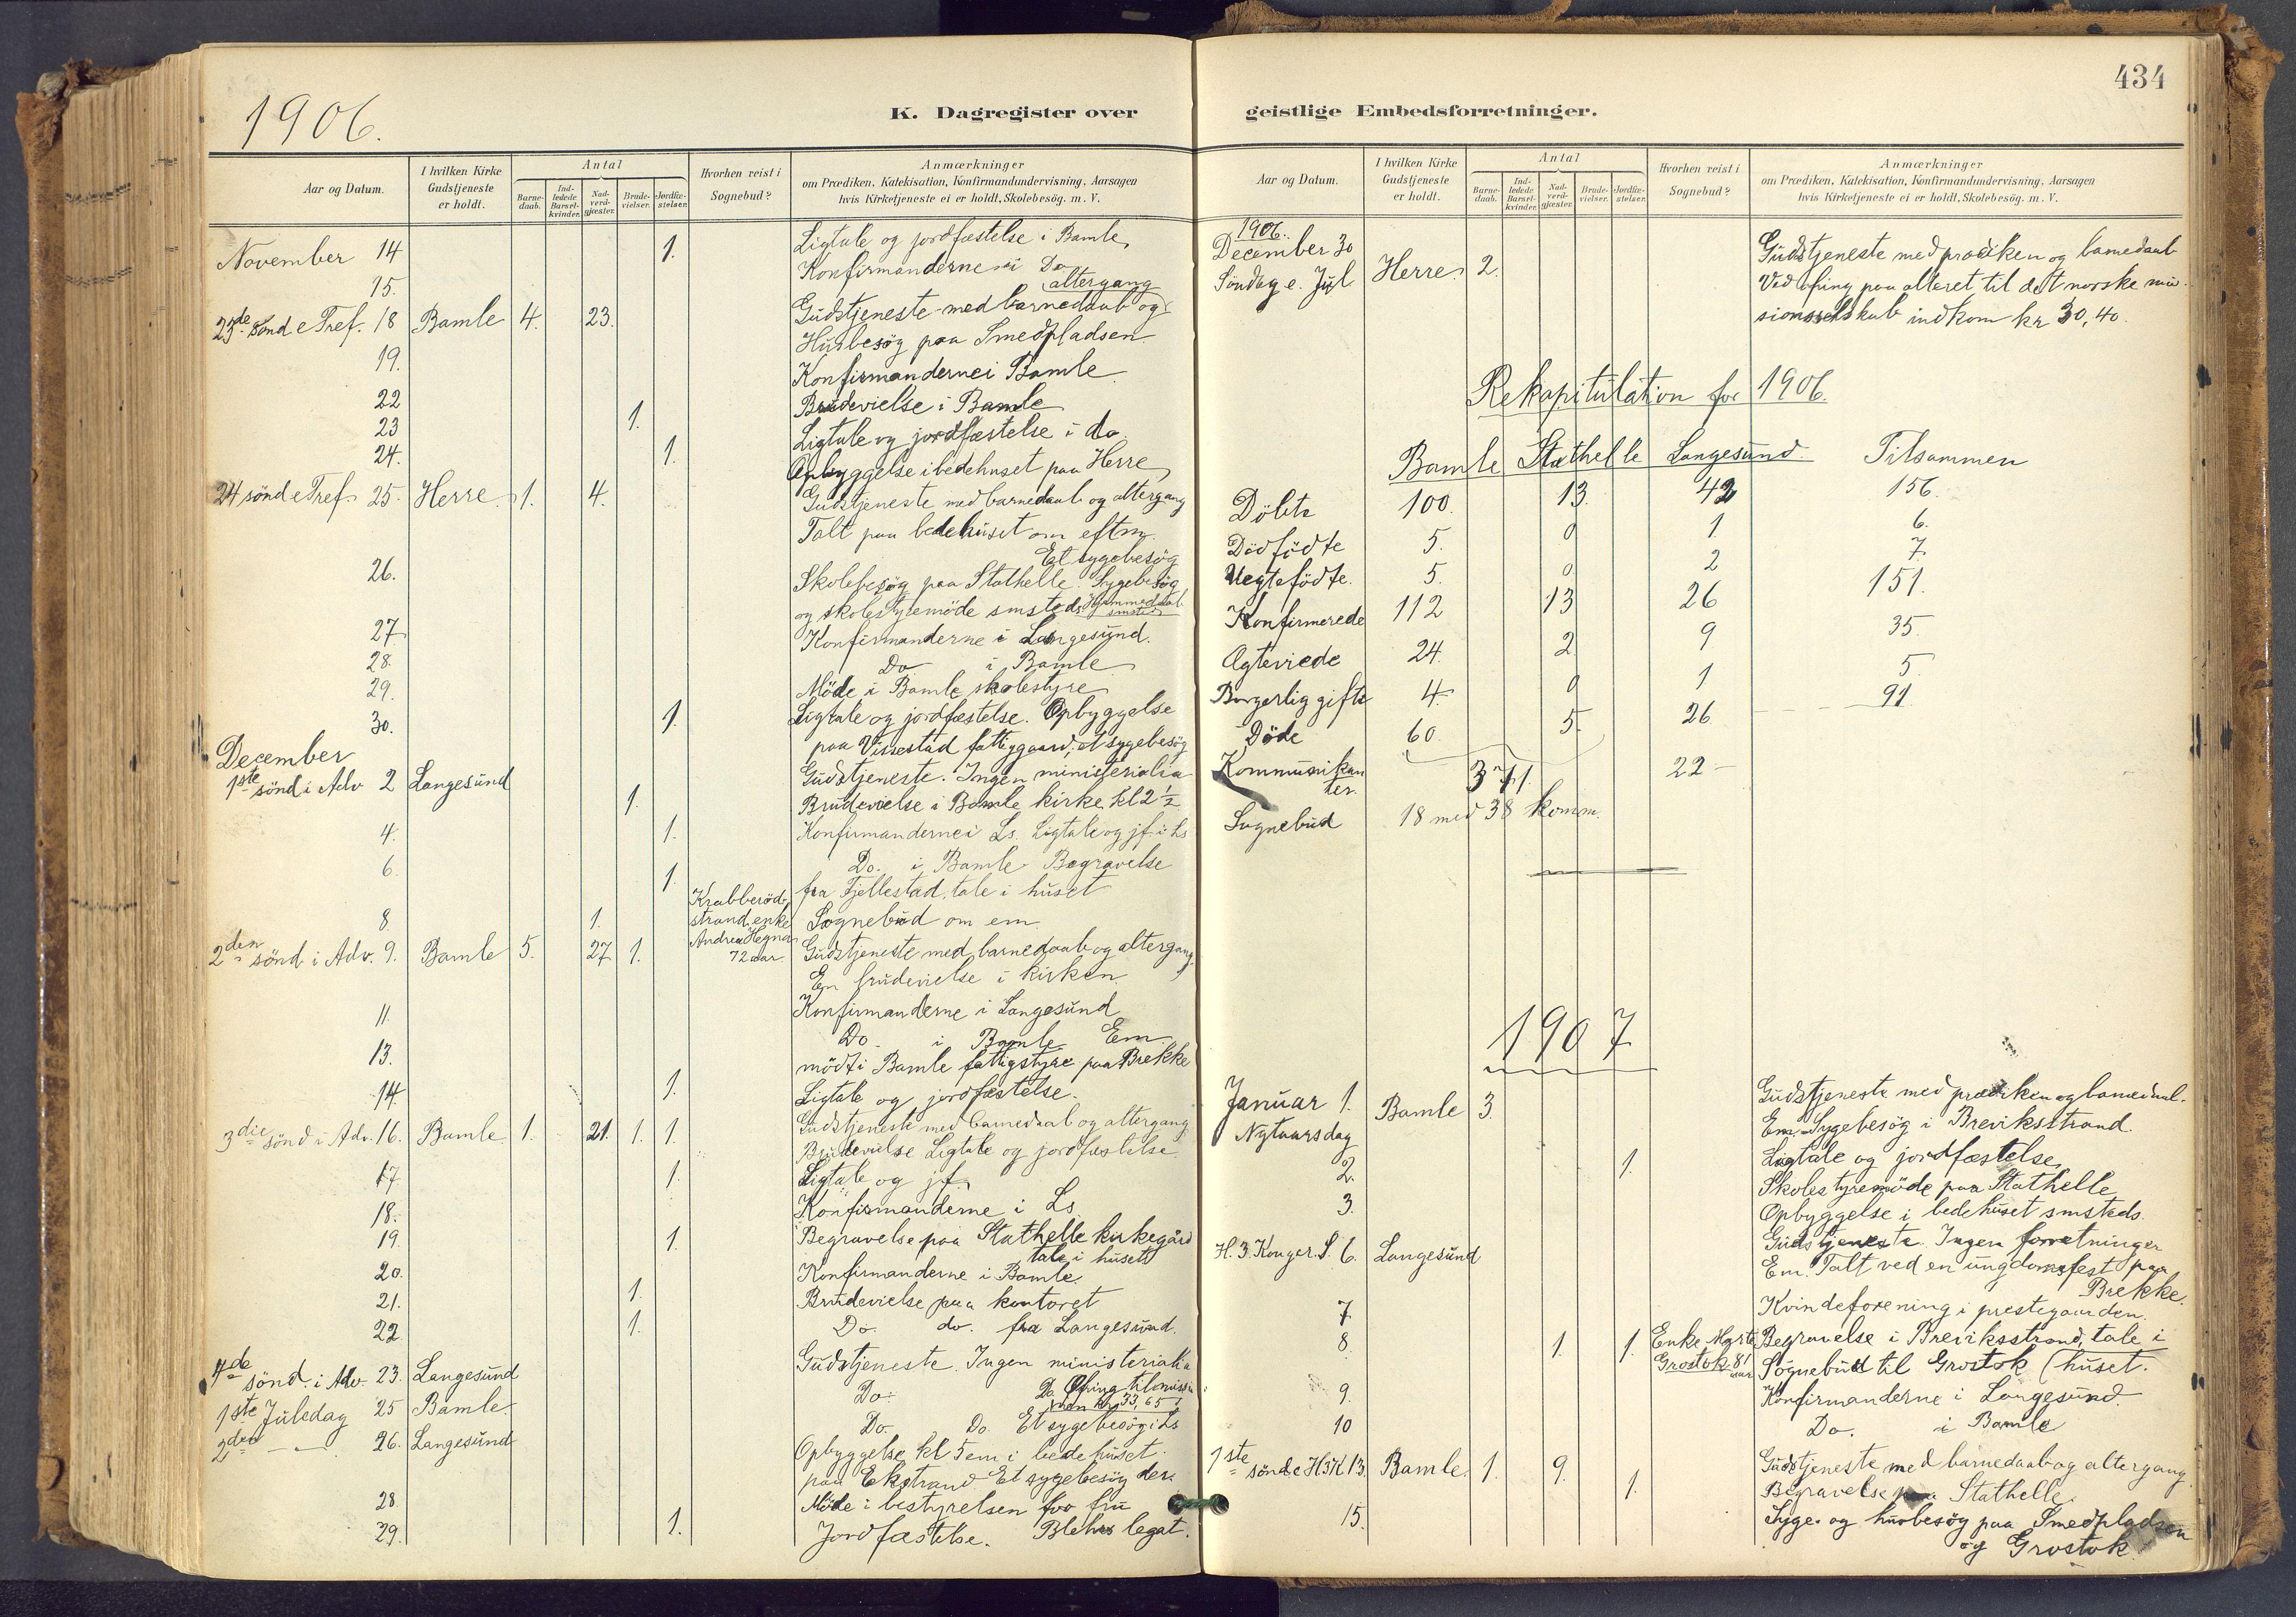 SAKO, Bamble kirkebøker, F/Fa/L0009: Ministerialbok nr. I 9, 1901-1917, s. 434